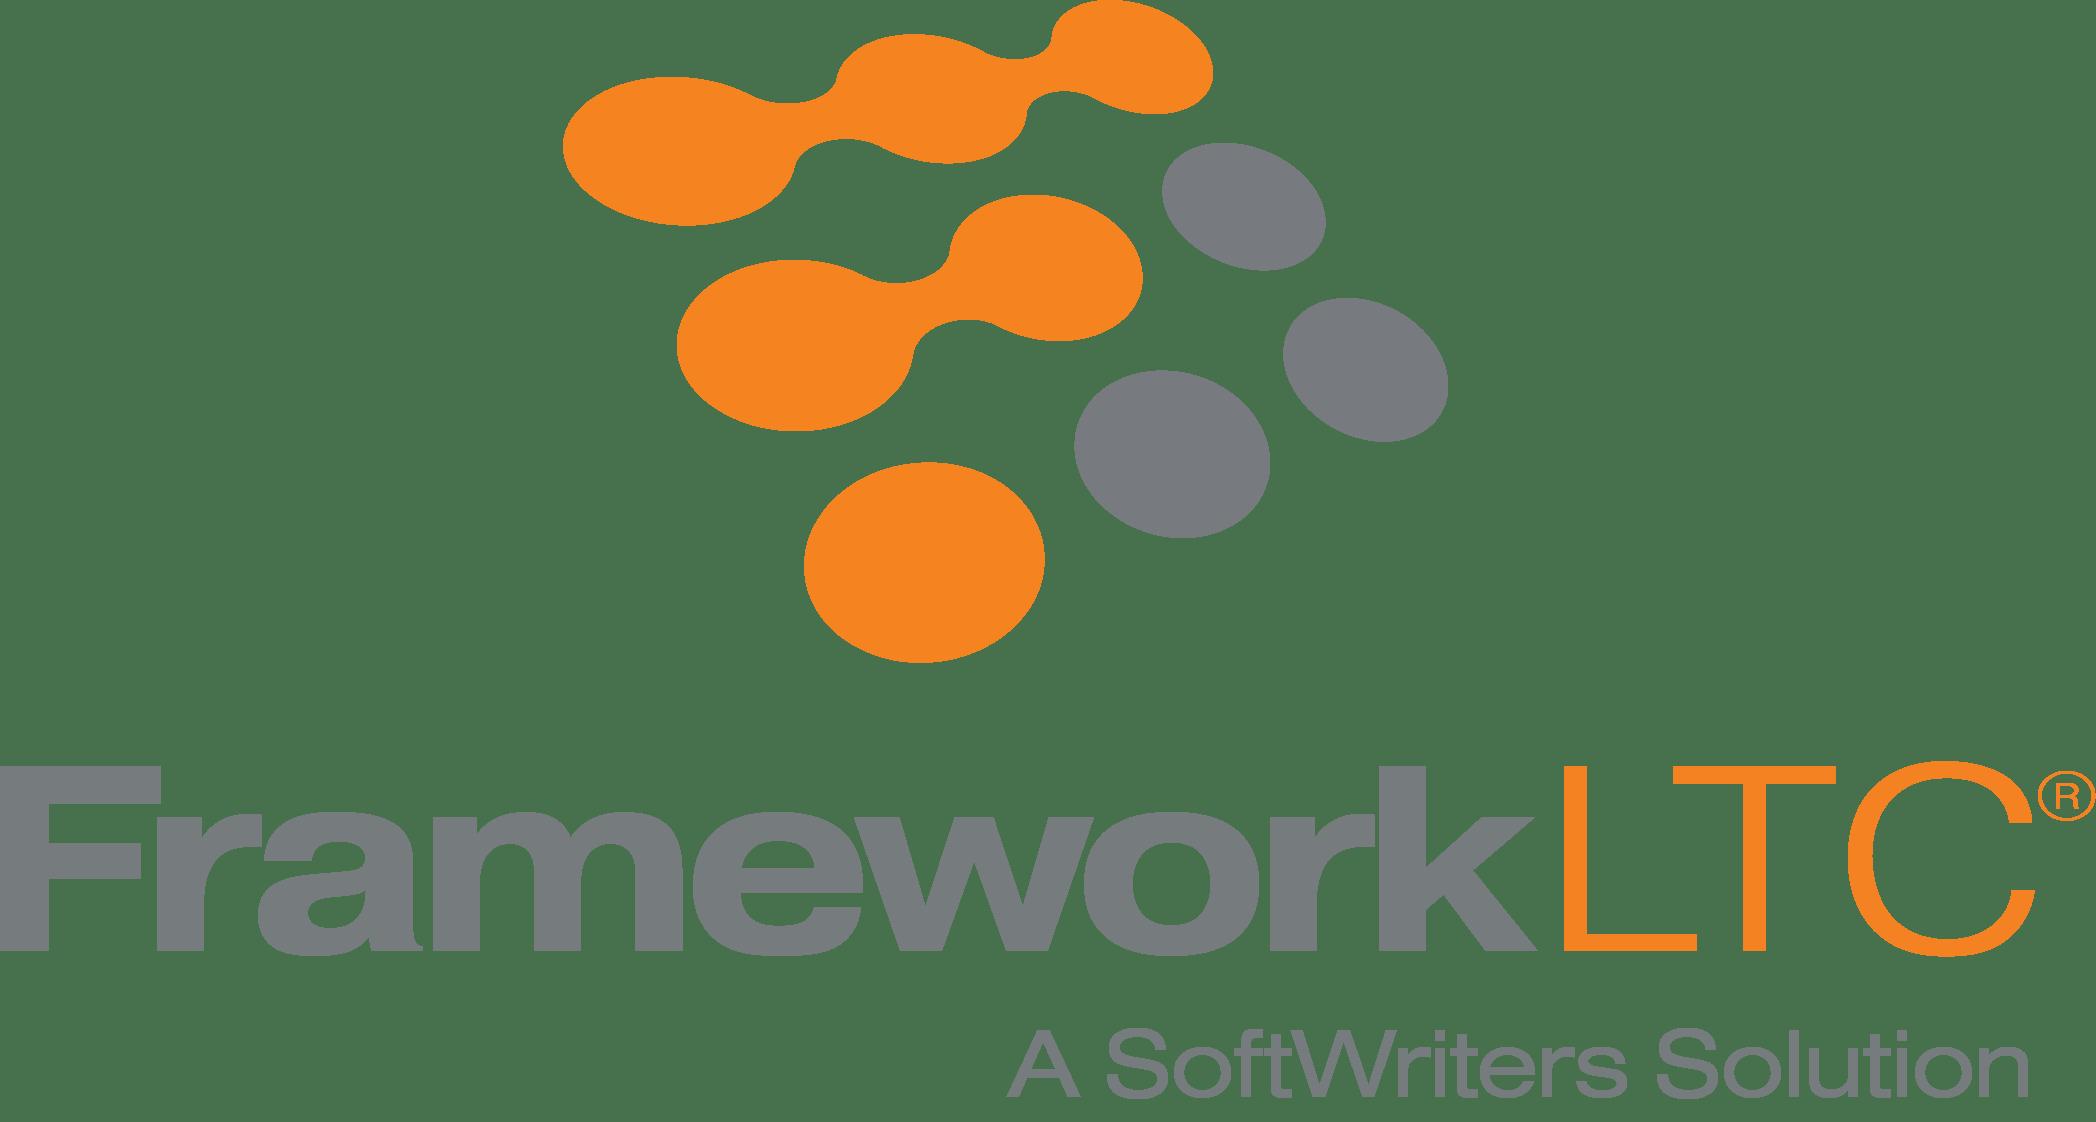 021_ComputerTalk_Buyers_Guide_FrameworkLTC-Vertical-SWI_Logo